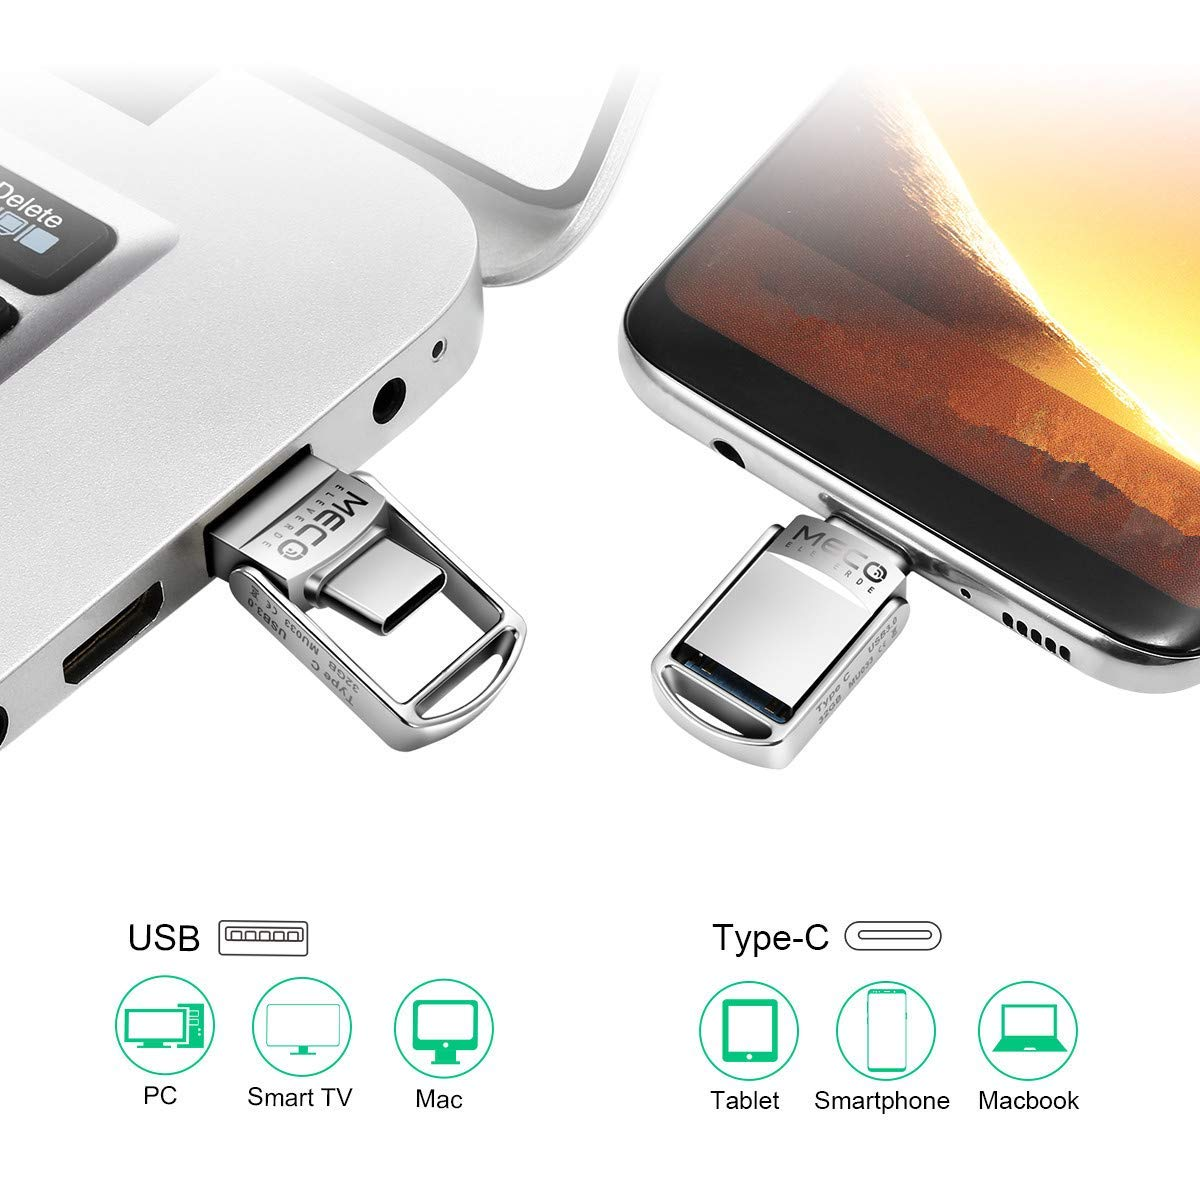 USB Stick 32GB, MECO ELEVERDE USB C Stick OTG USB 3.0 Mini Memory Stick 2-in-1 Speicherstick Aluminium Weihnachten